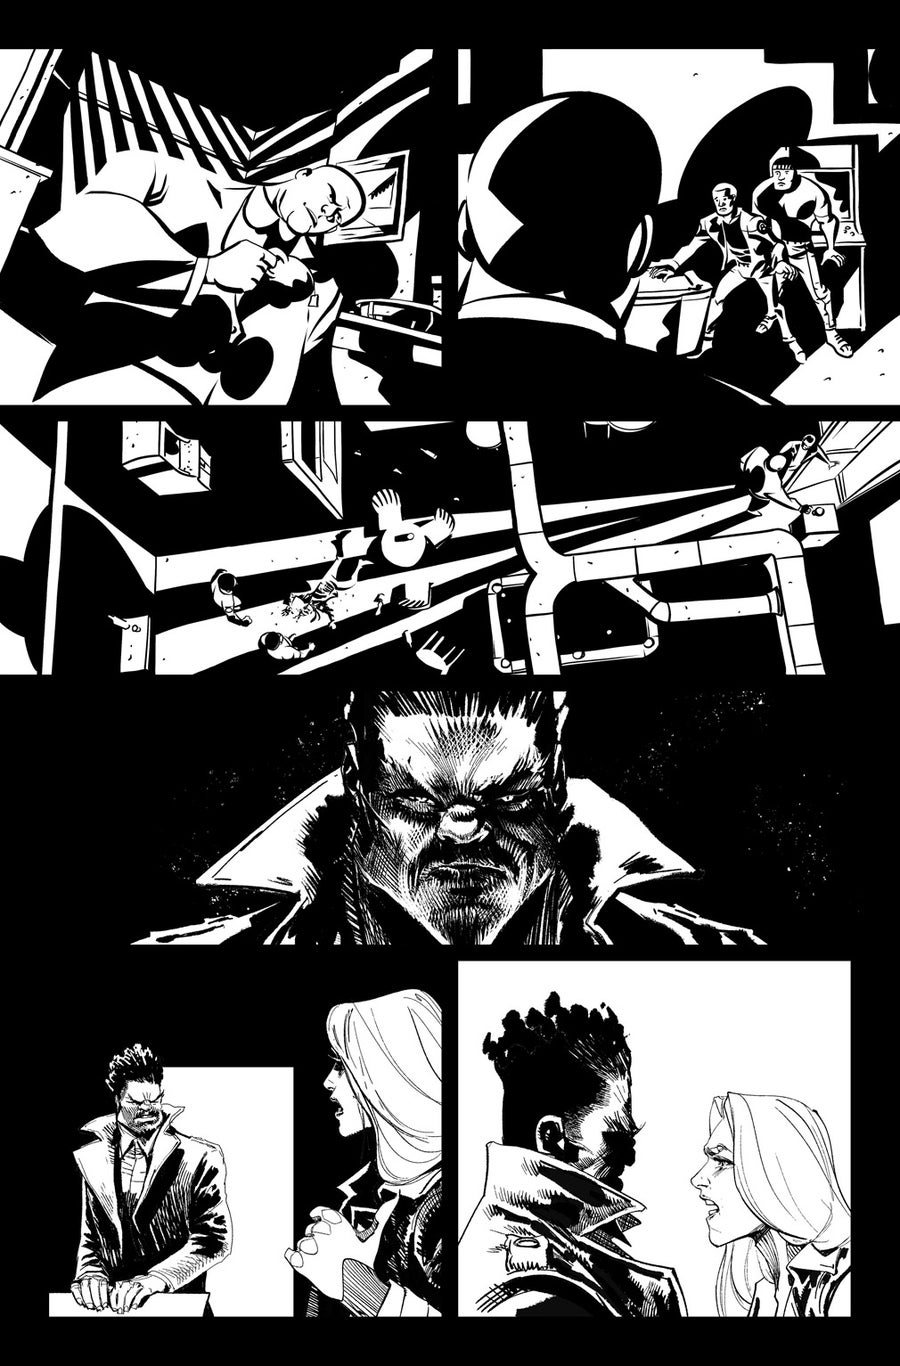 Image of DEFENDERS #8, p.08 ARTIST'S PROOF